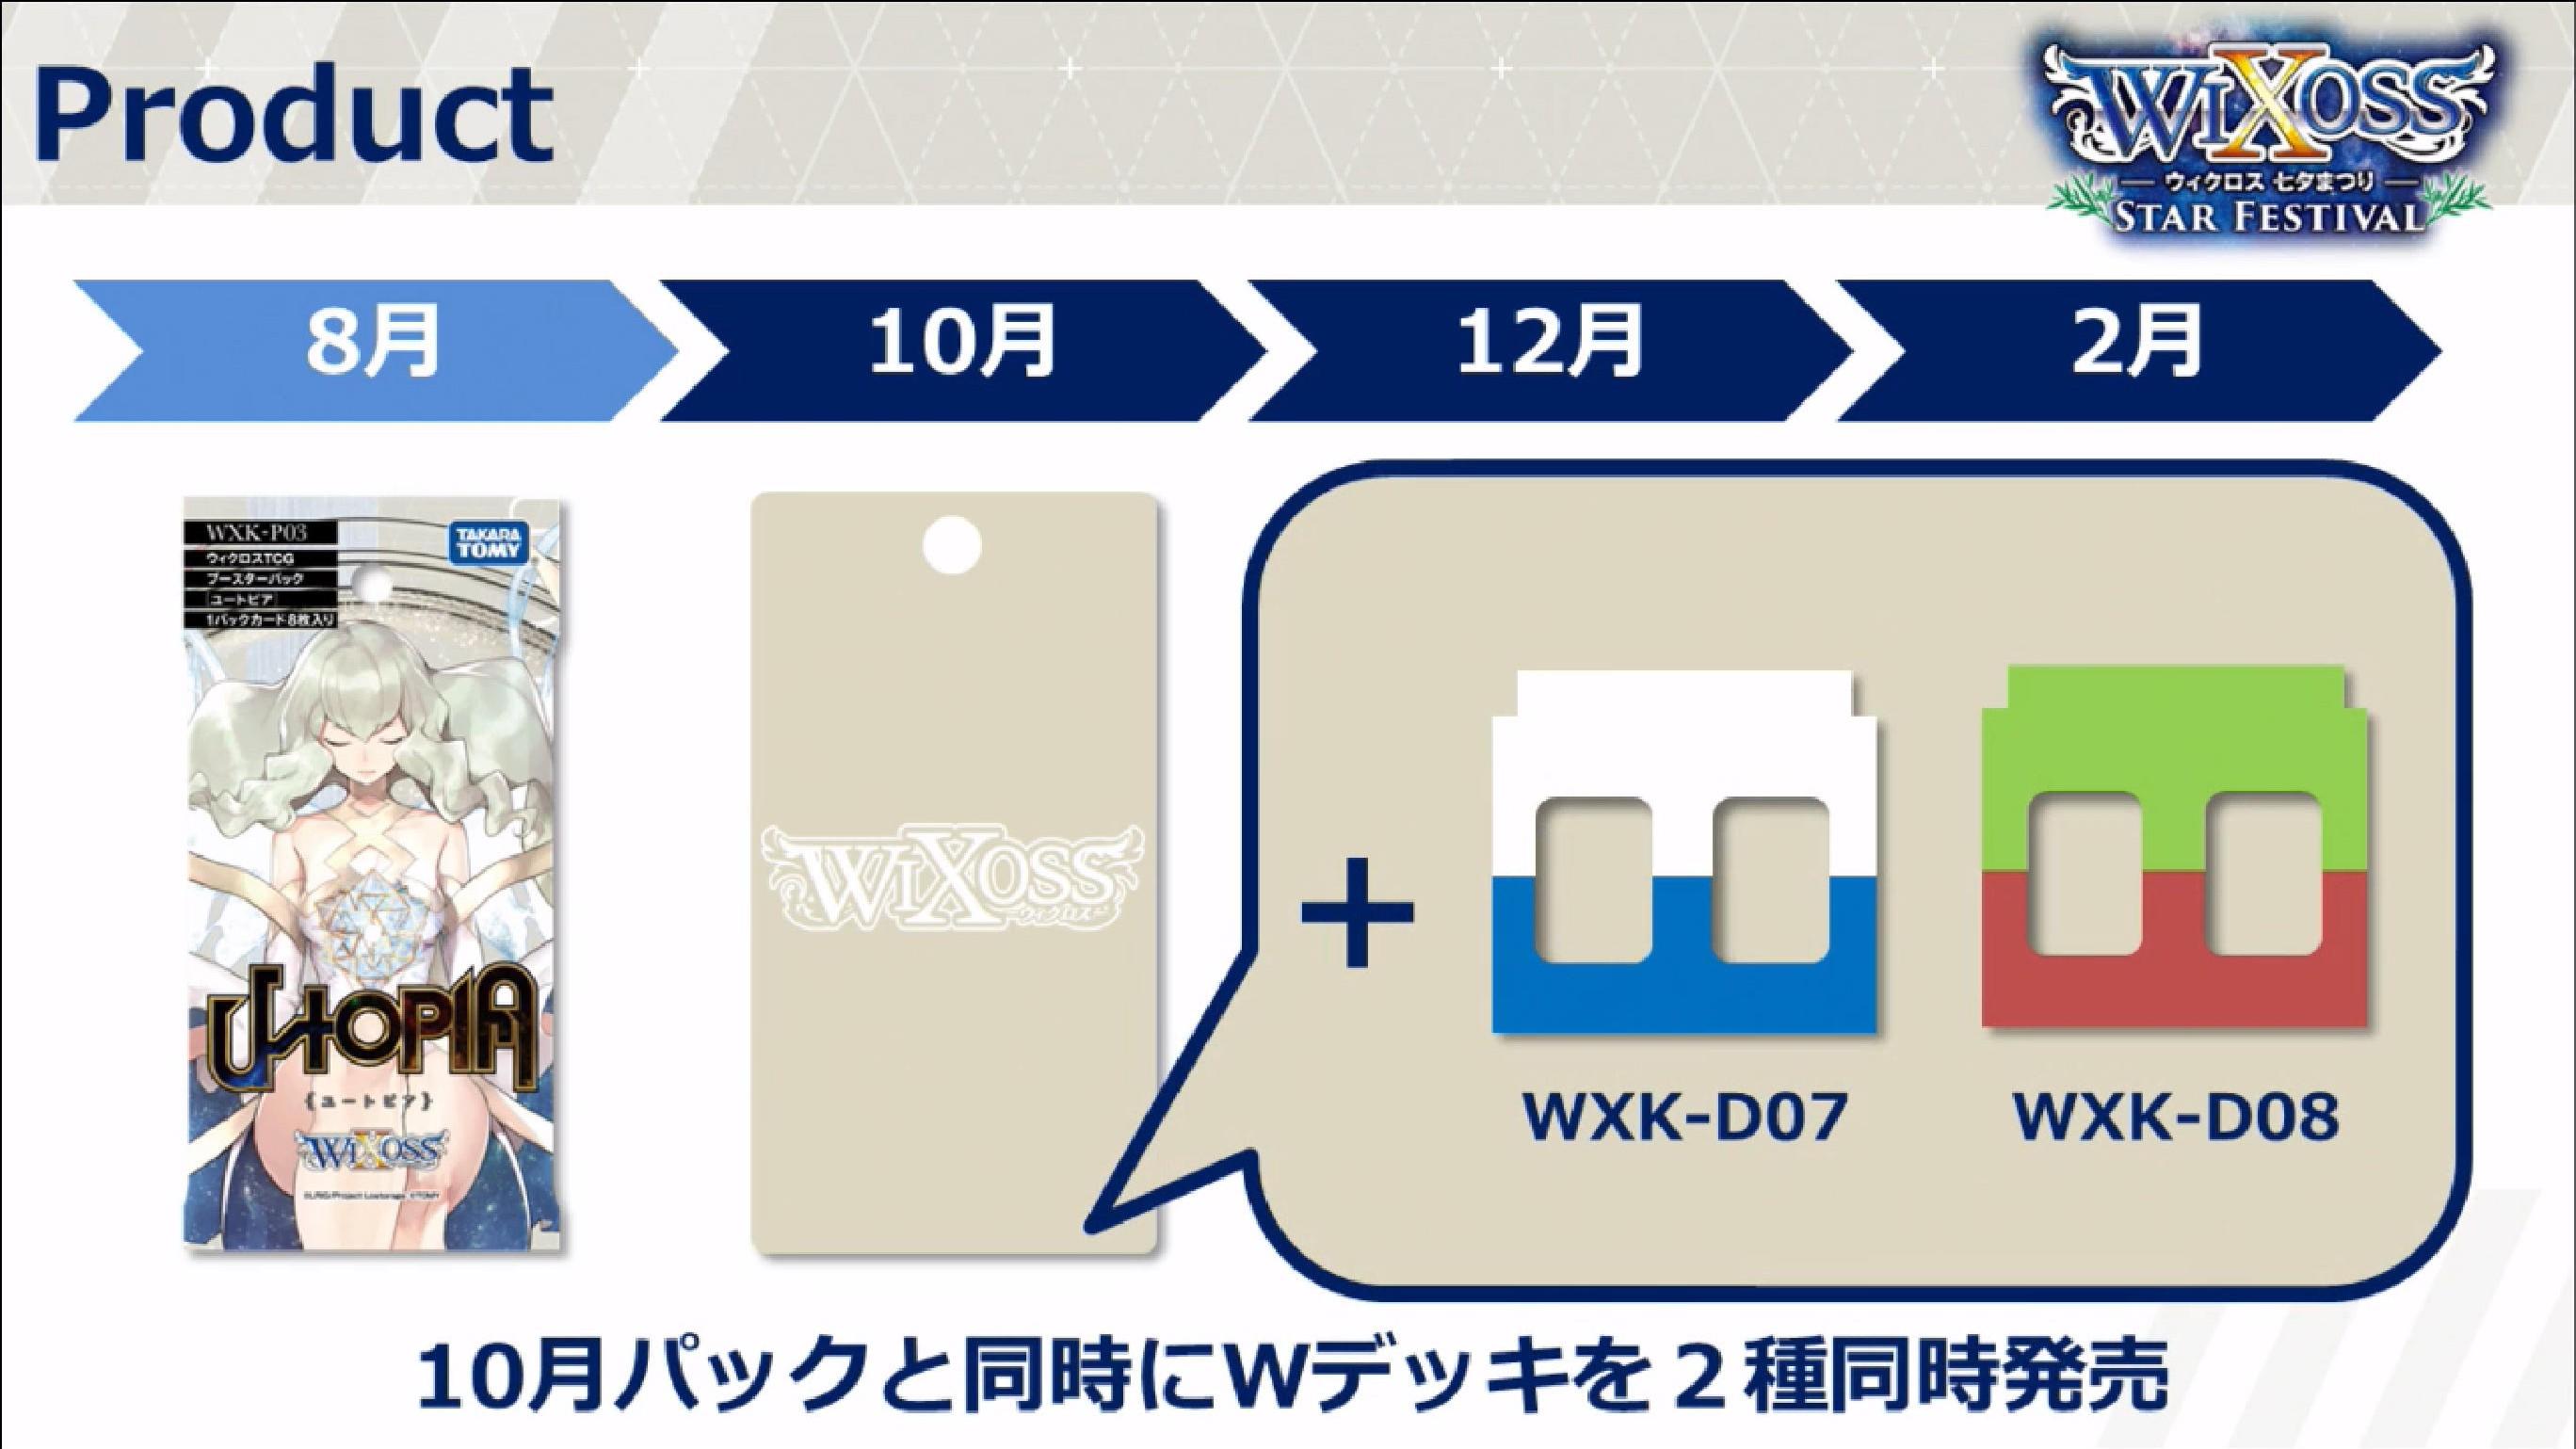 wixxos-live-20180701-024.jpg